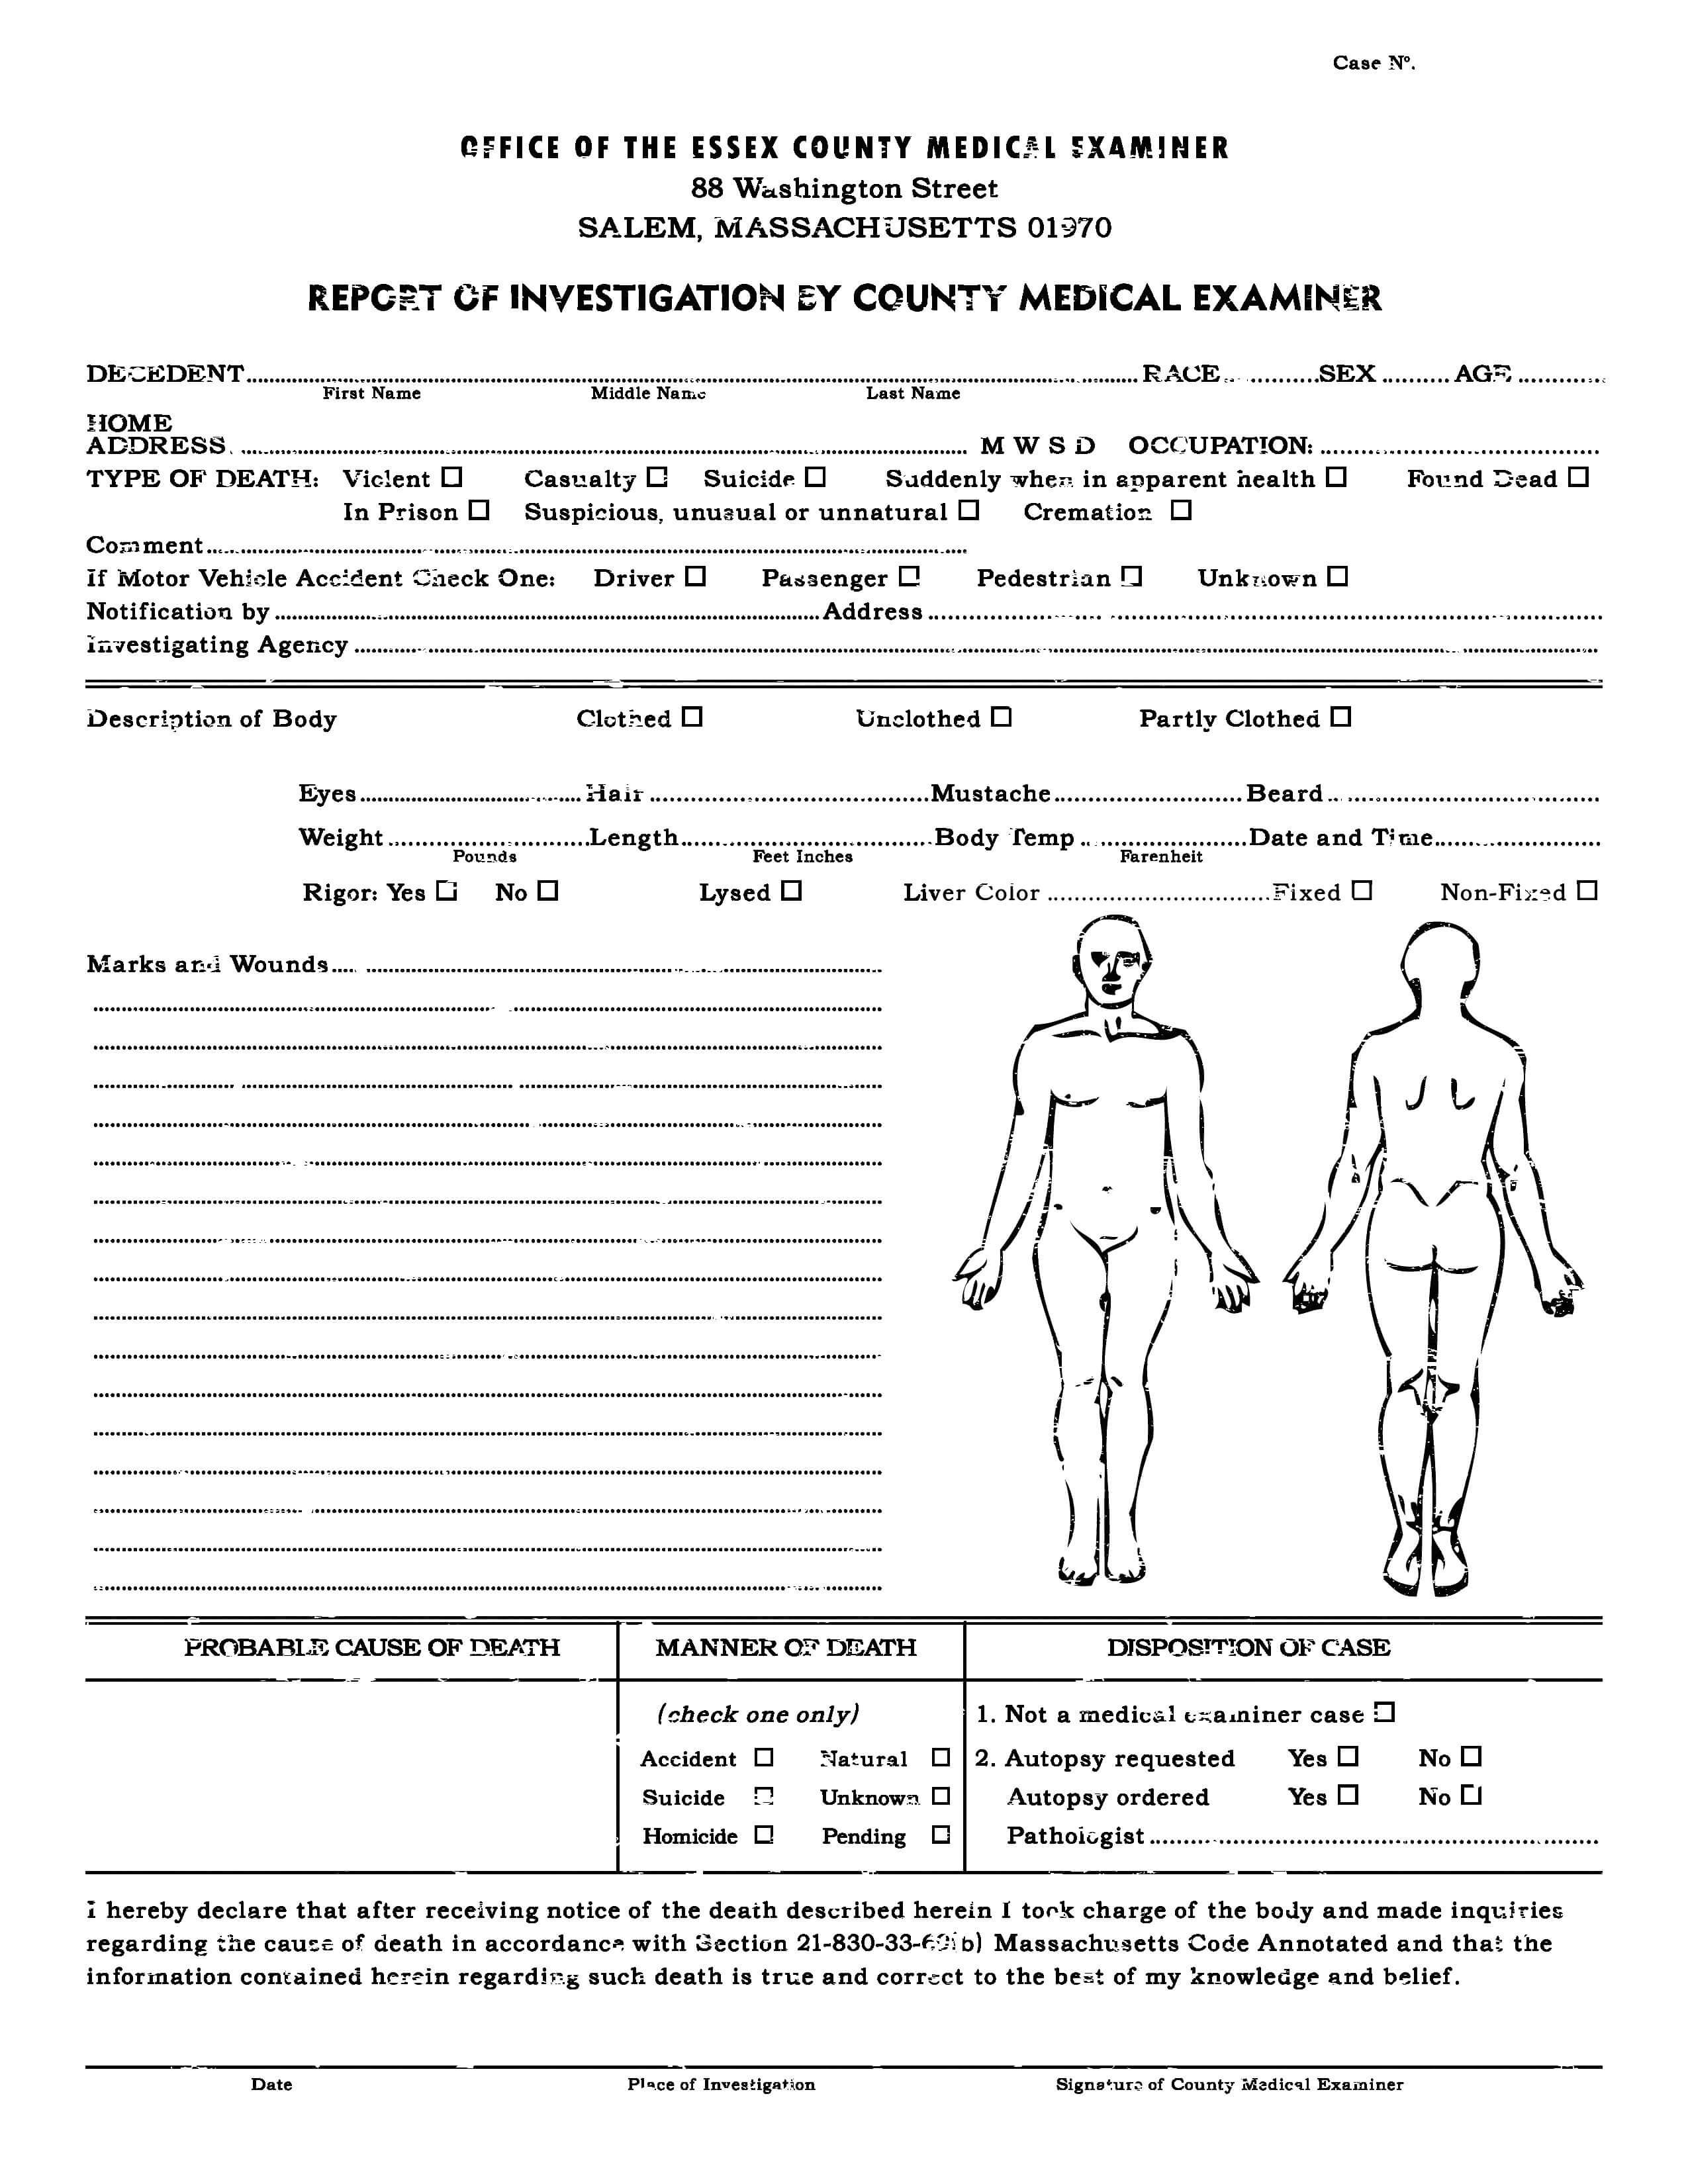 Autopsy Report Template Google Docs Blank Coroners Format With Blank Autopsy Report Template